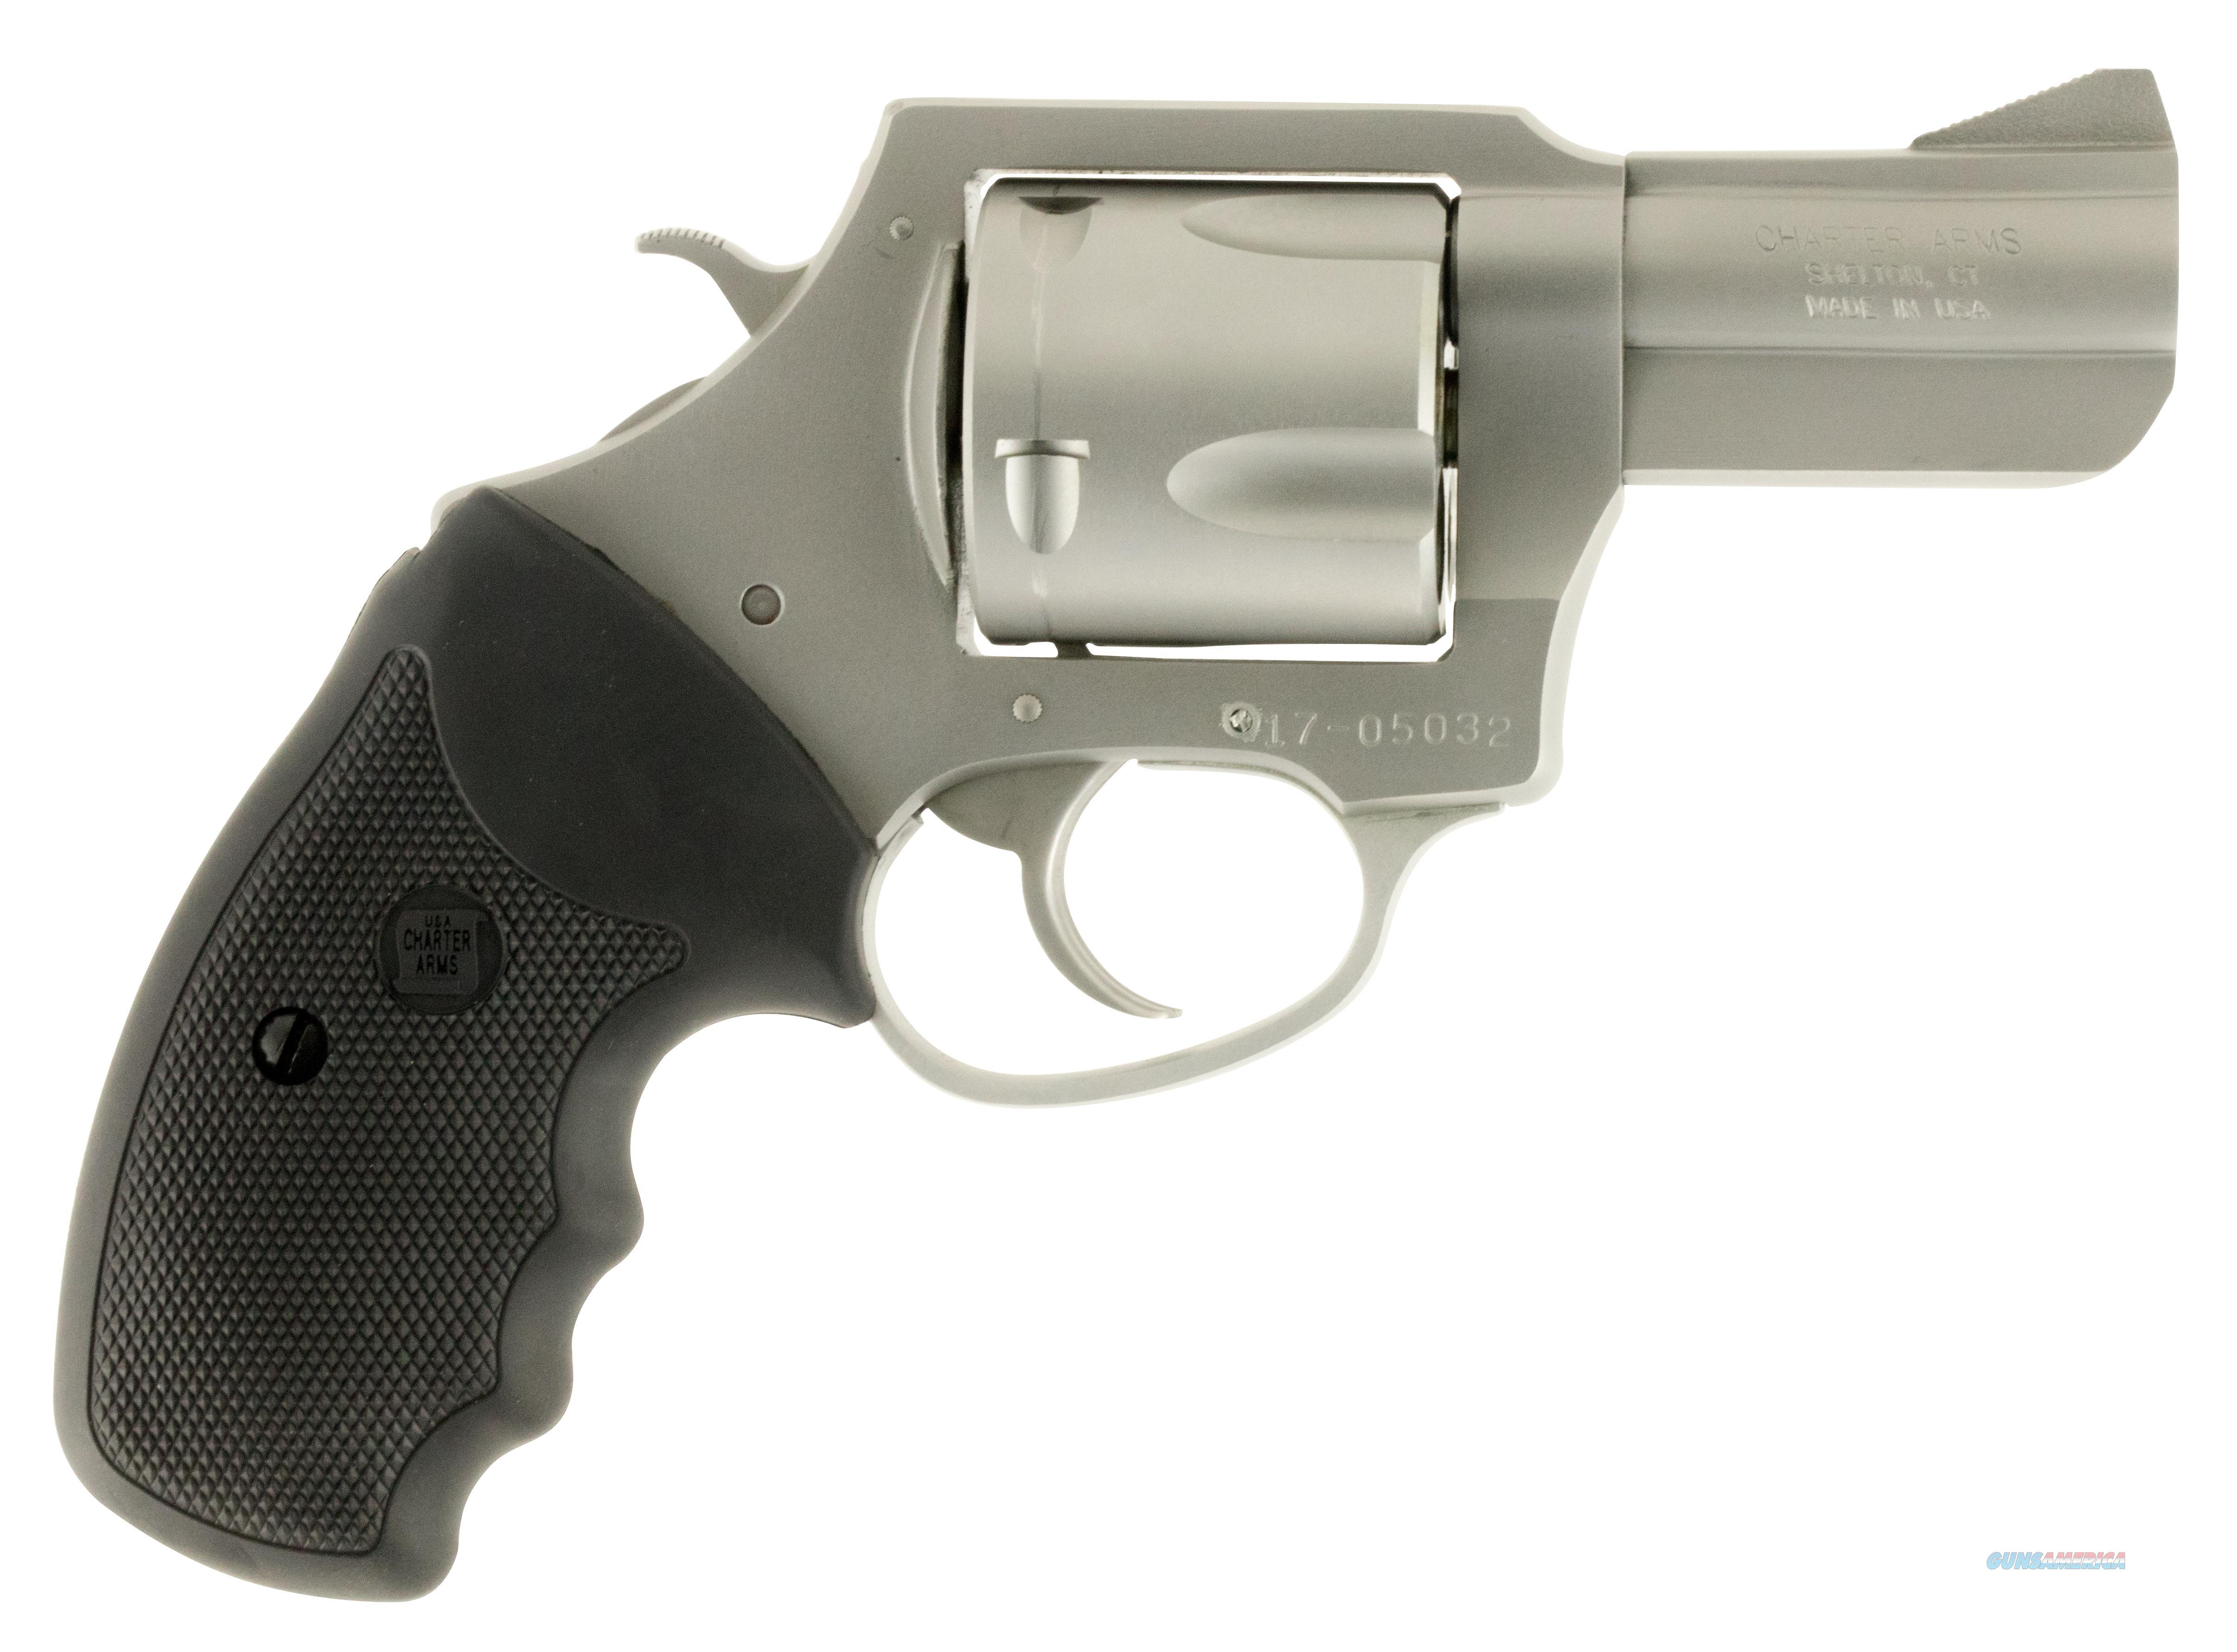 "Charter Arms Pitbull 45Acp 2.5"" 5Rd.2"" 74520  Guns > Pistols > C Misc Pistols"